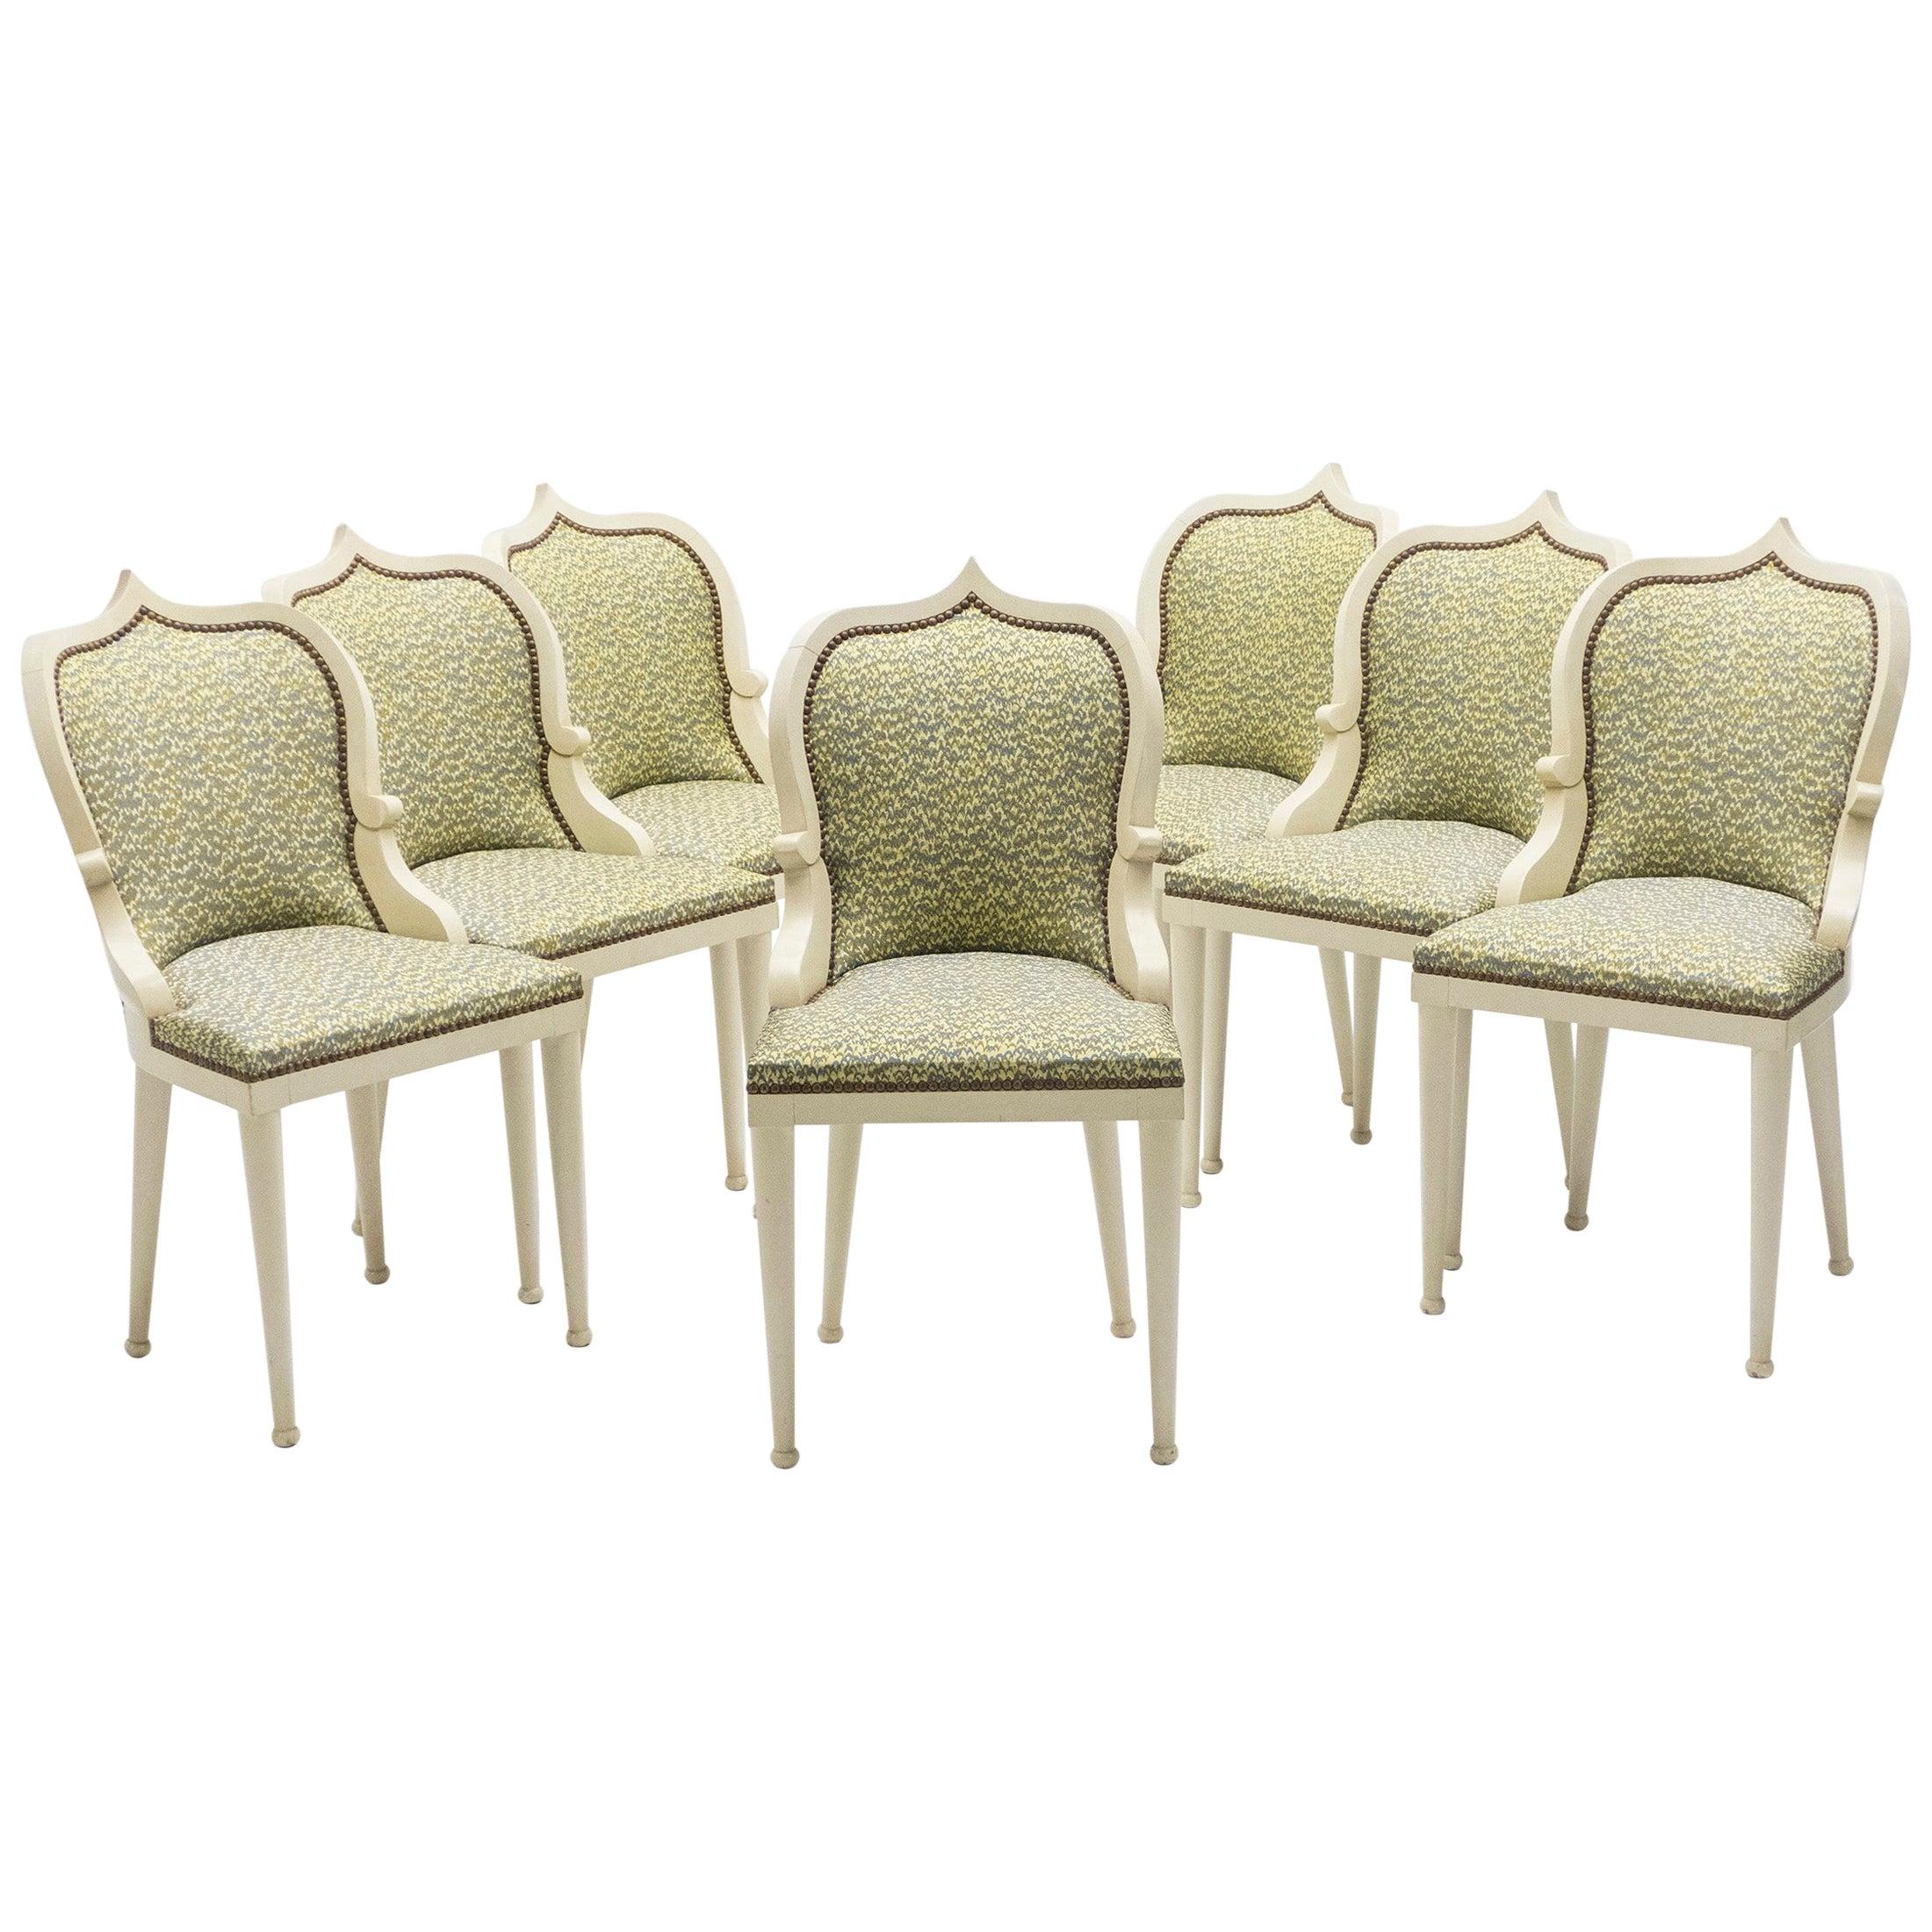 Unique, Set of 15, Garouste & Bonetti 'Palace' Dining Chairs, 1980